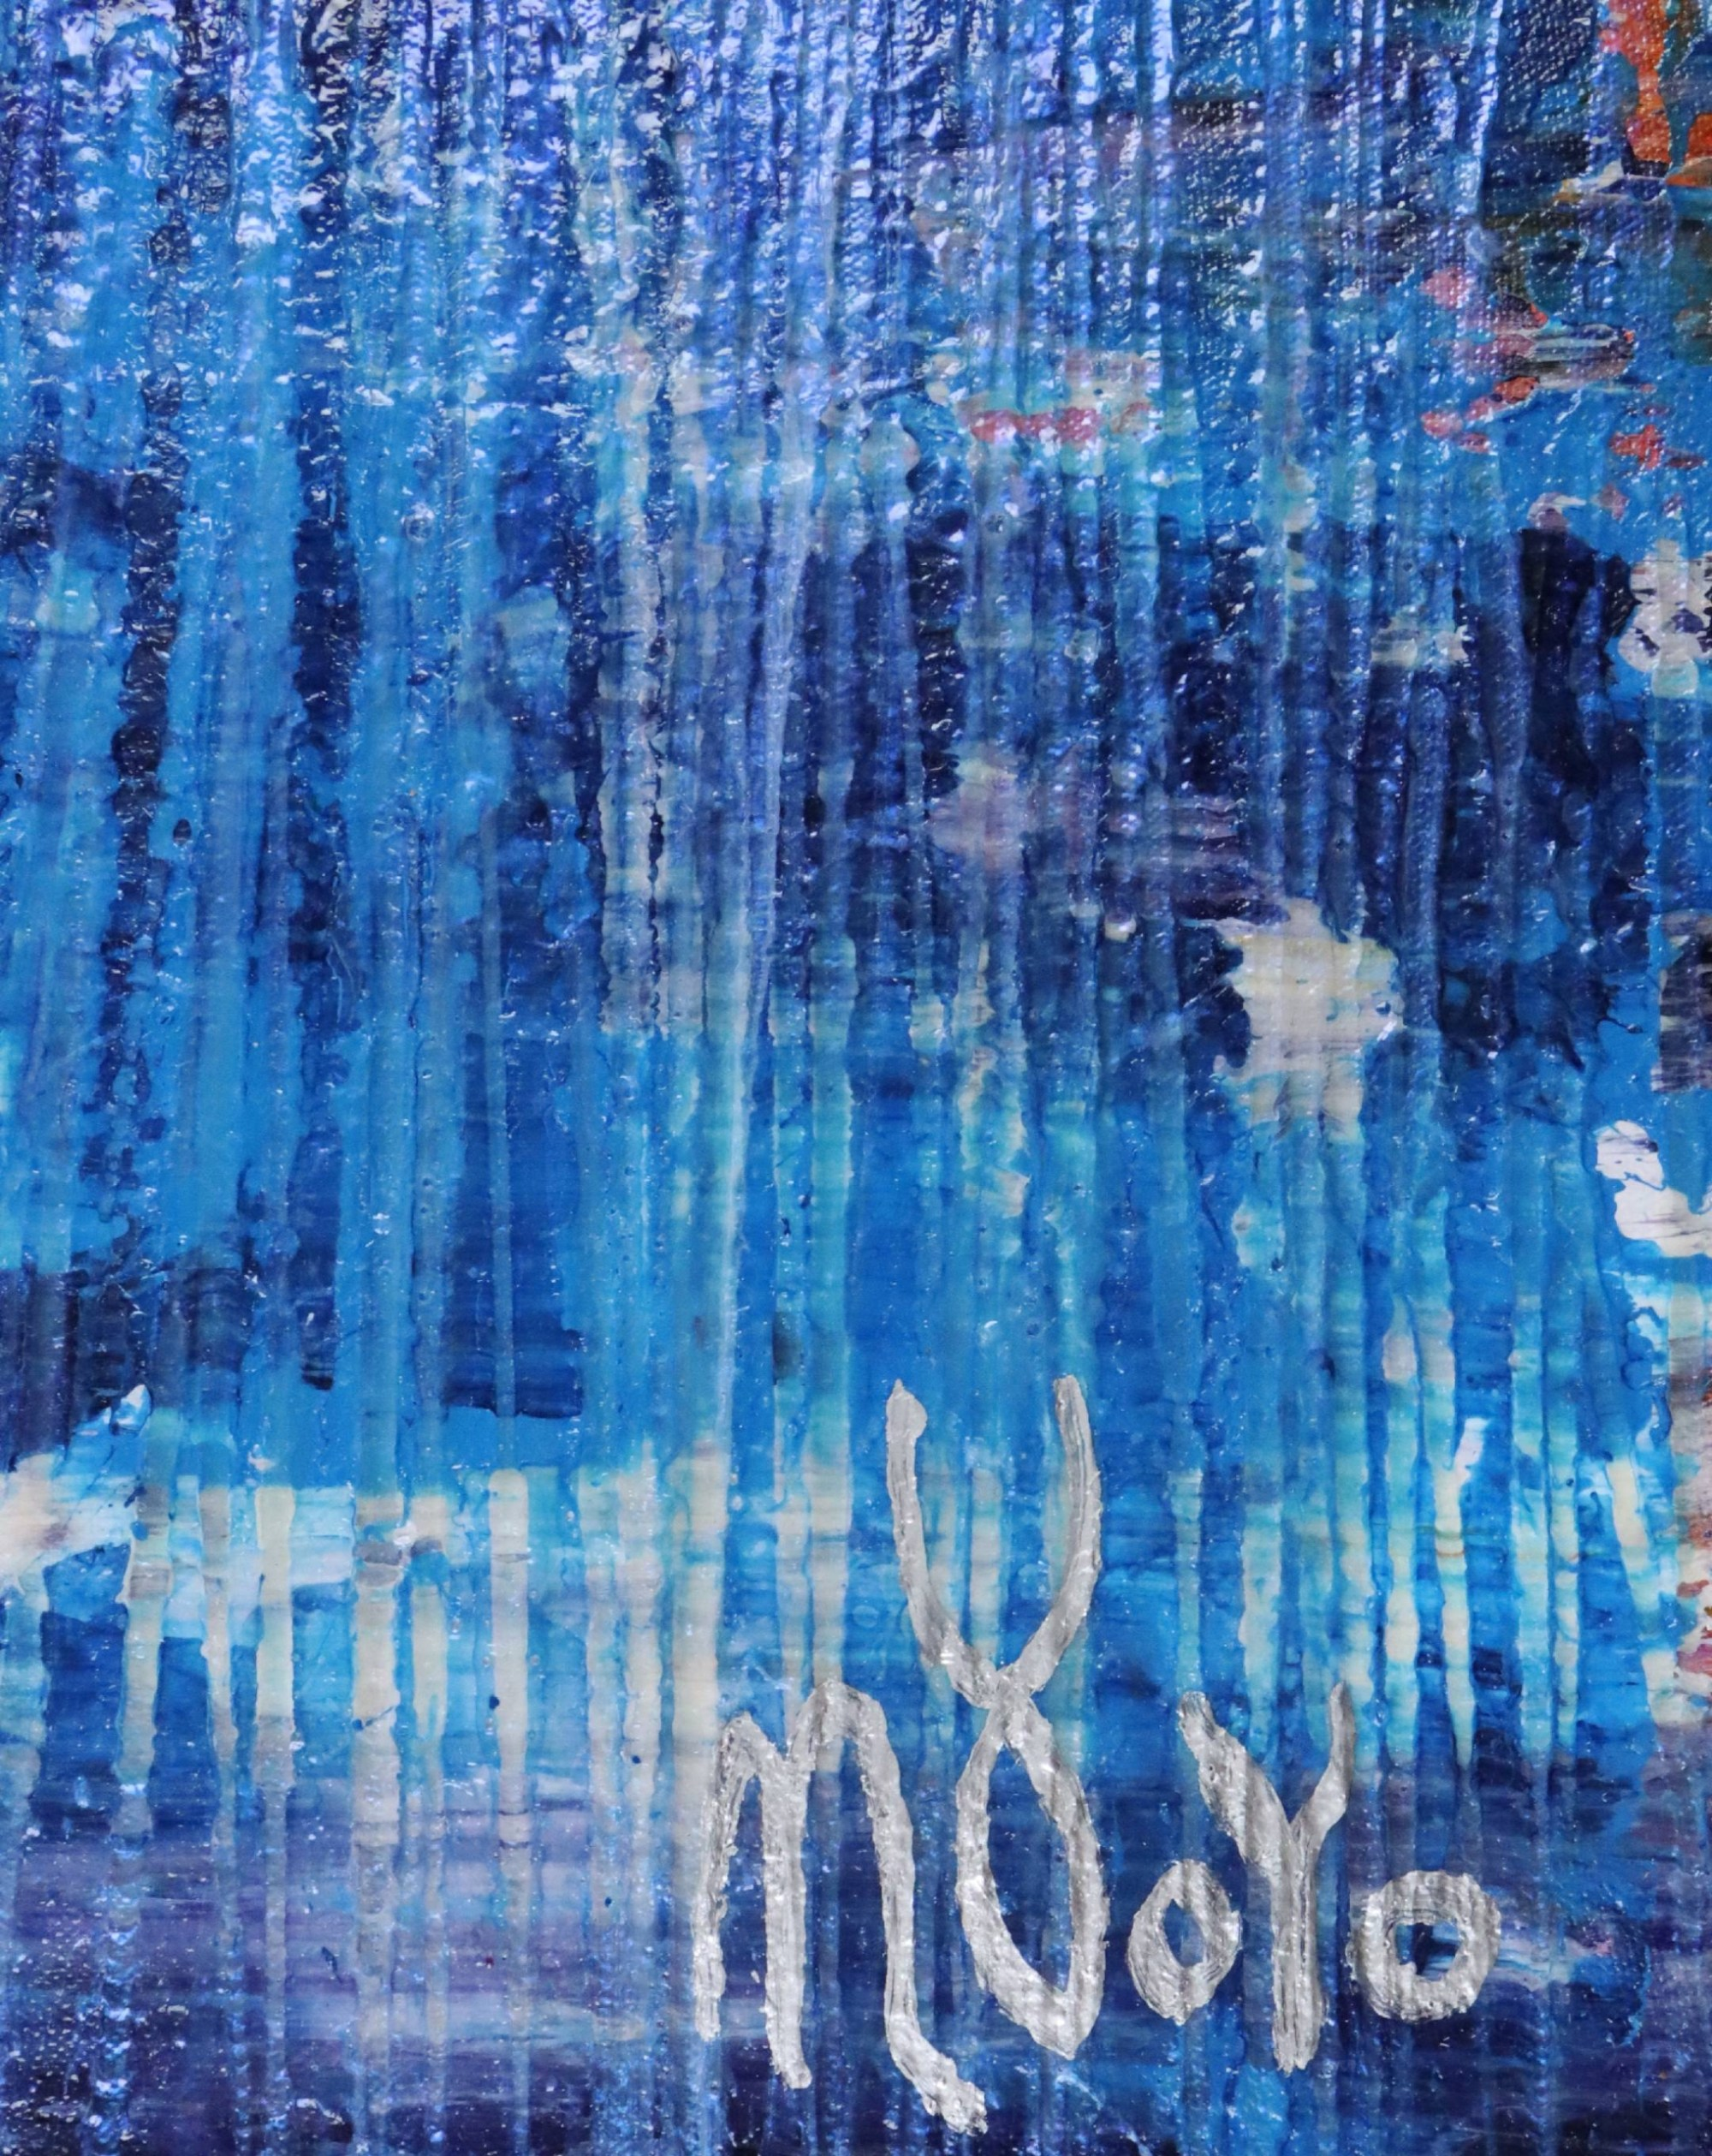 Signature - Torrential Night Storm (A Closer Look) (2020) by Nestor Toro